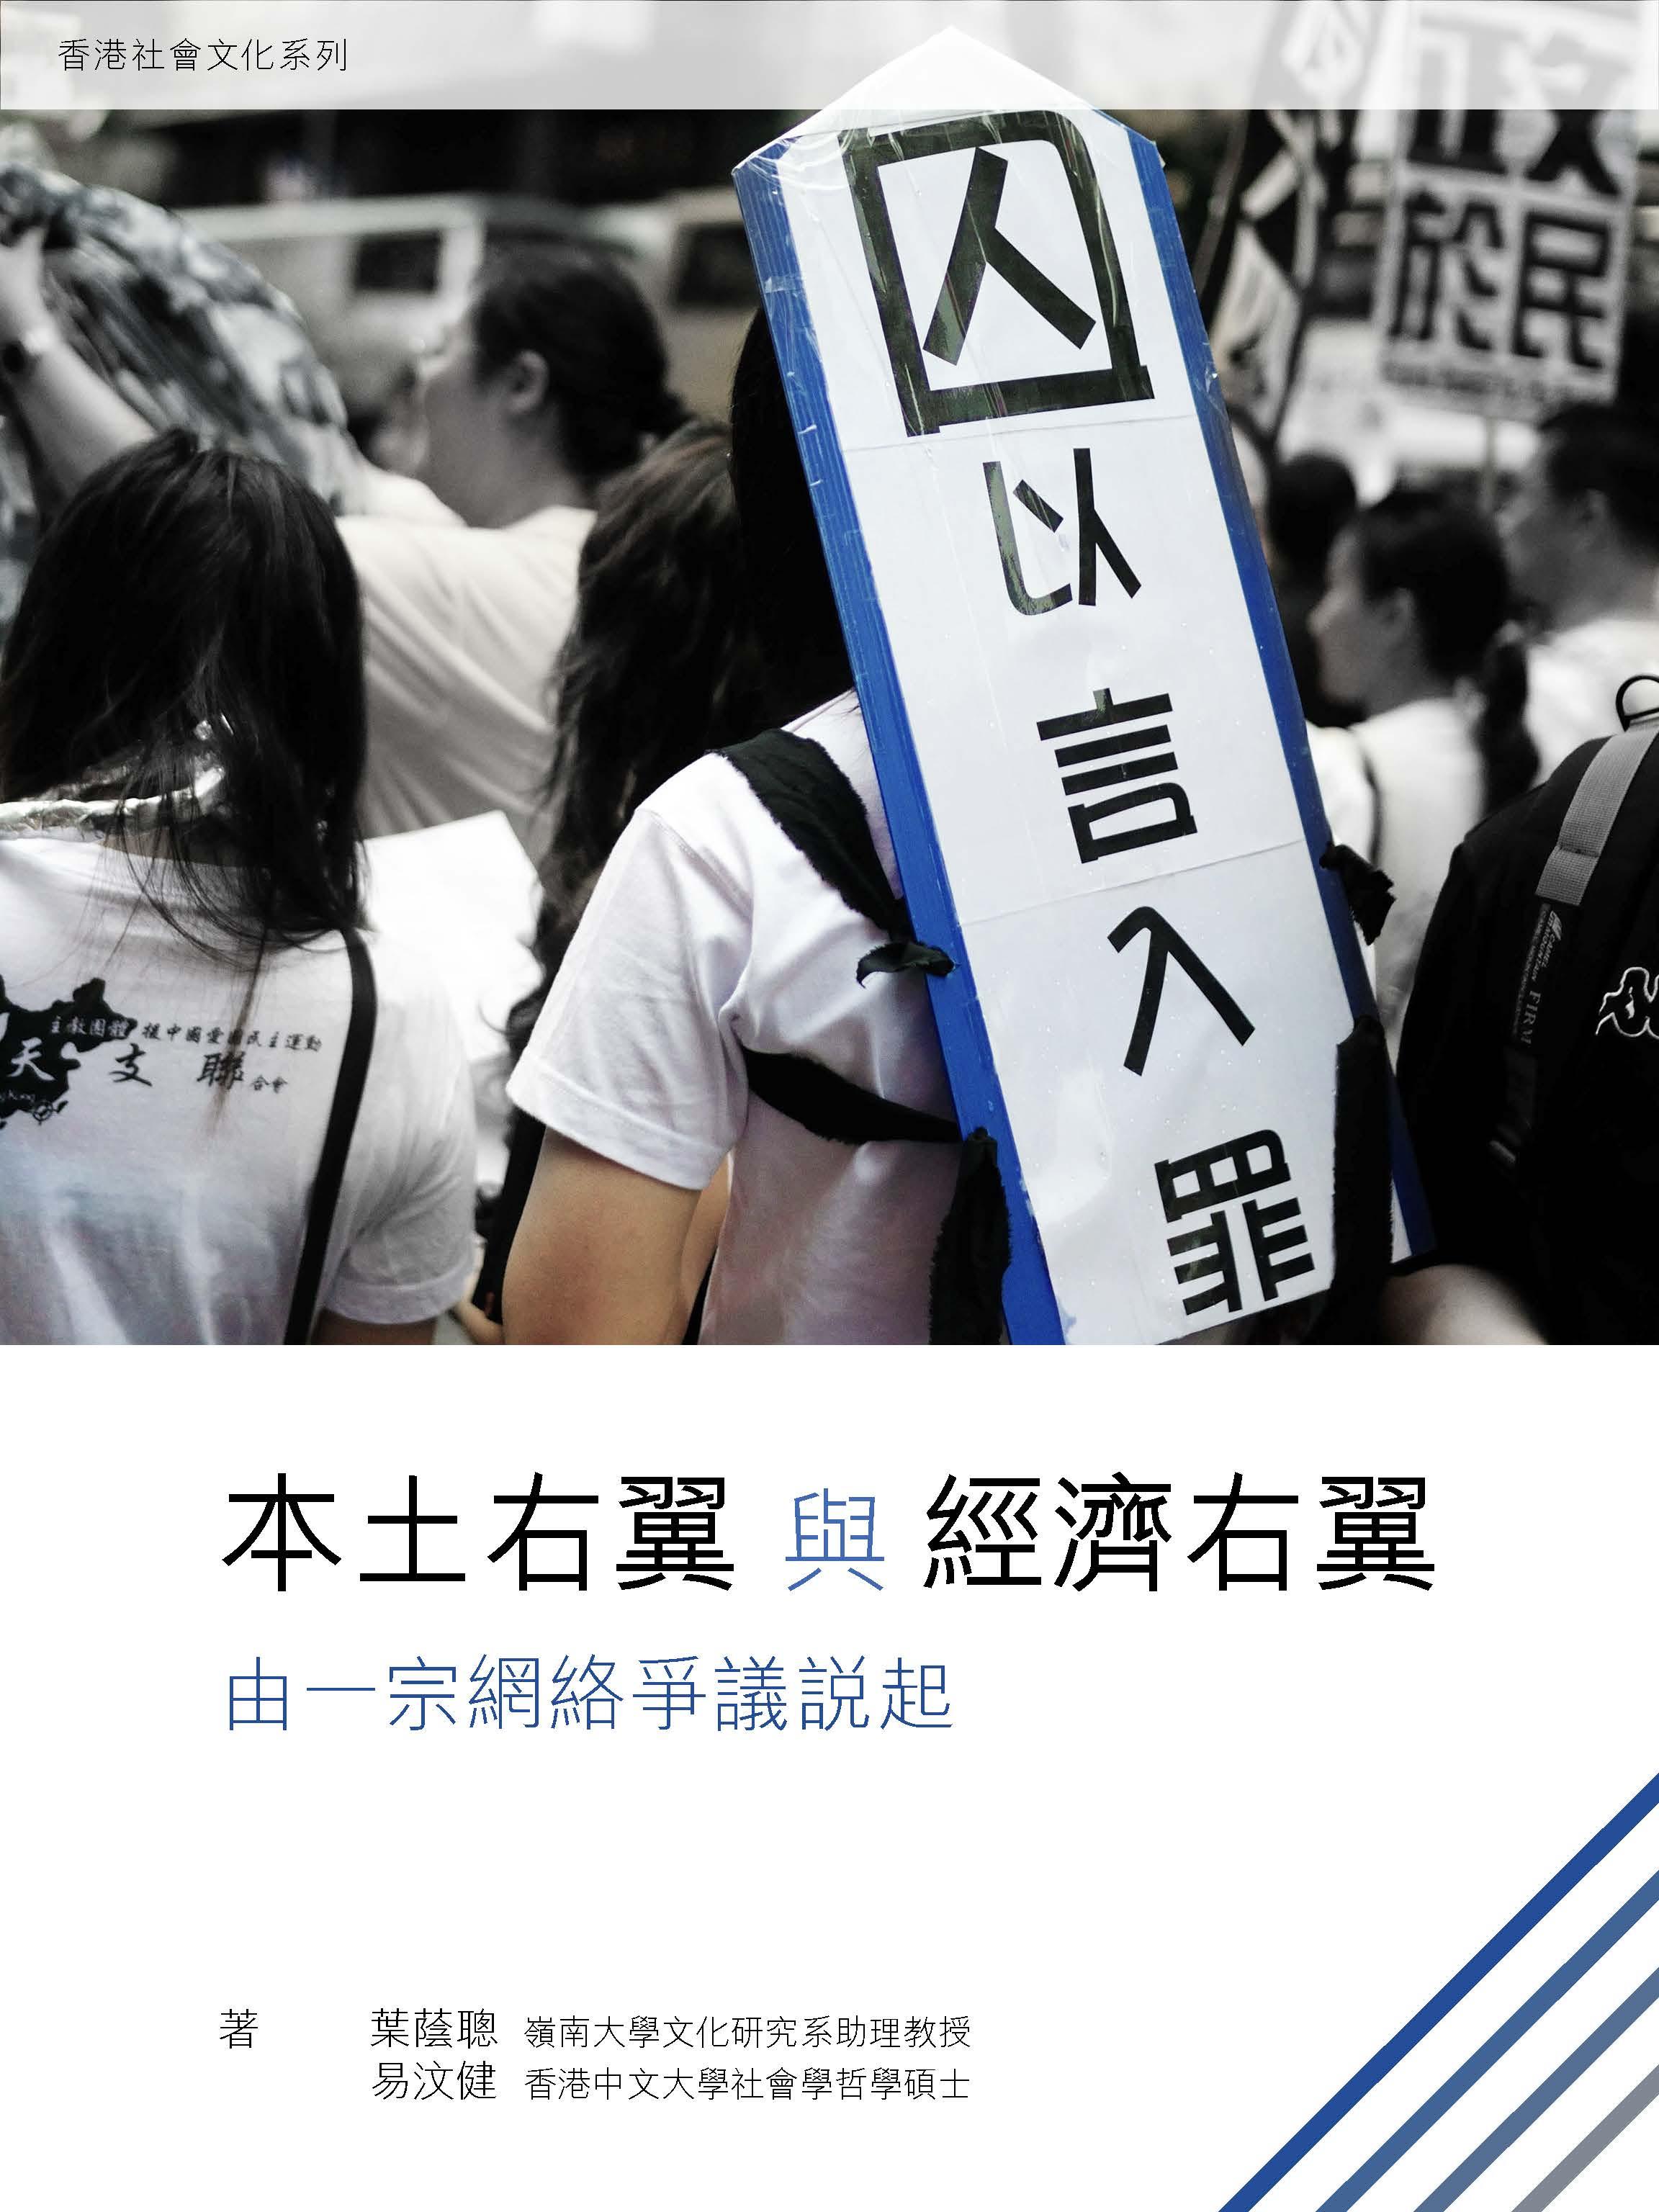 HKSCS-011-ilcymk